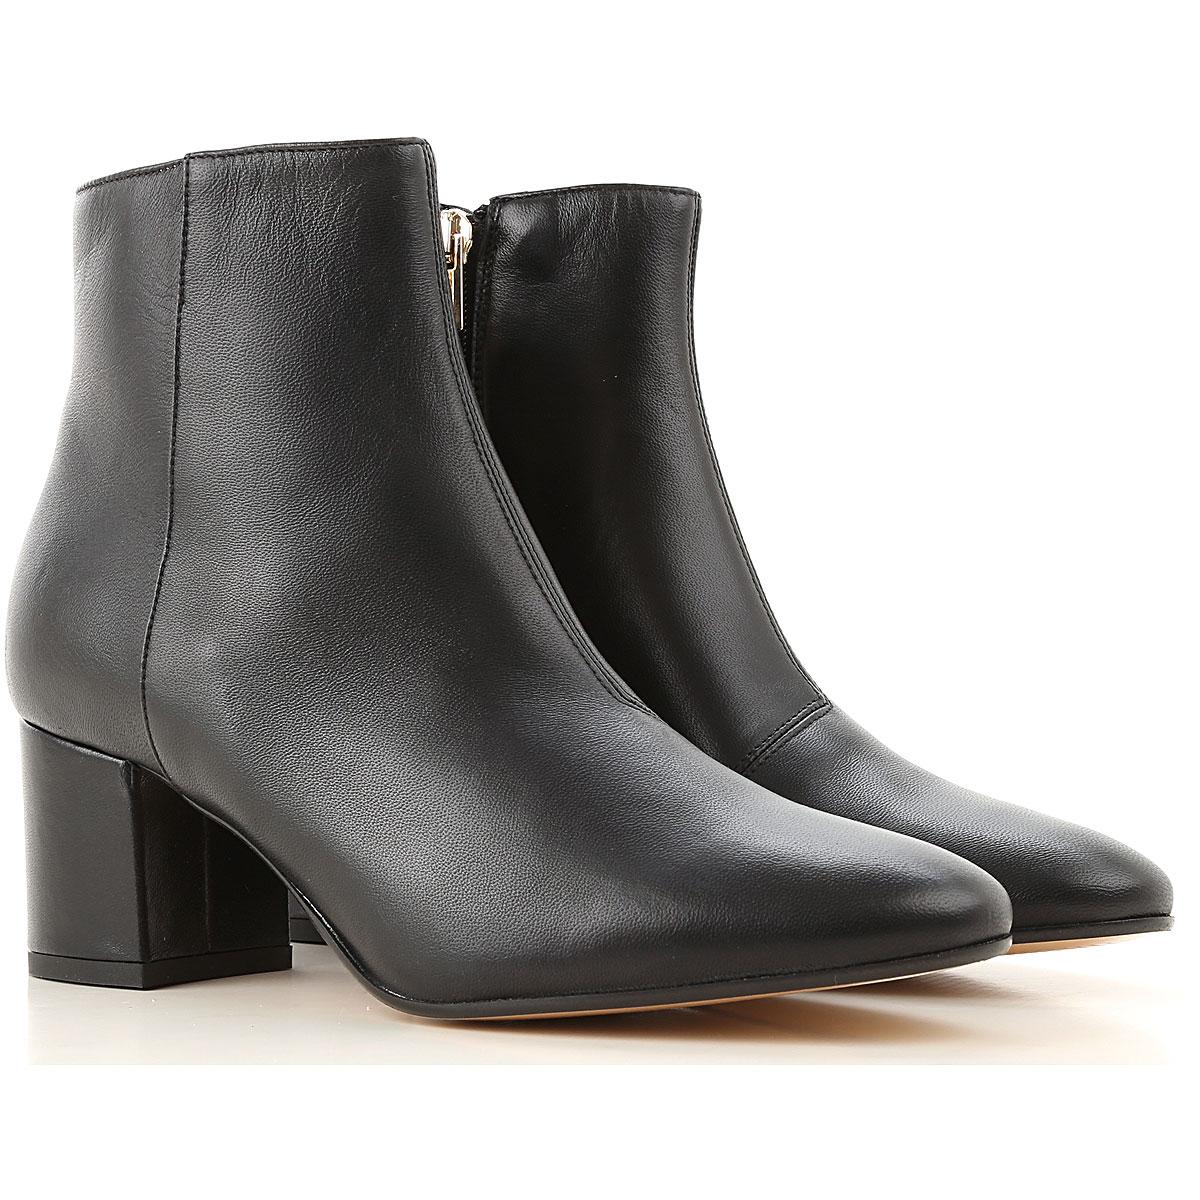 Liu Jo Boots for Women, Booties On Sale, Black, Leather, 2019, 6 8 9